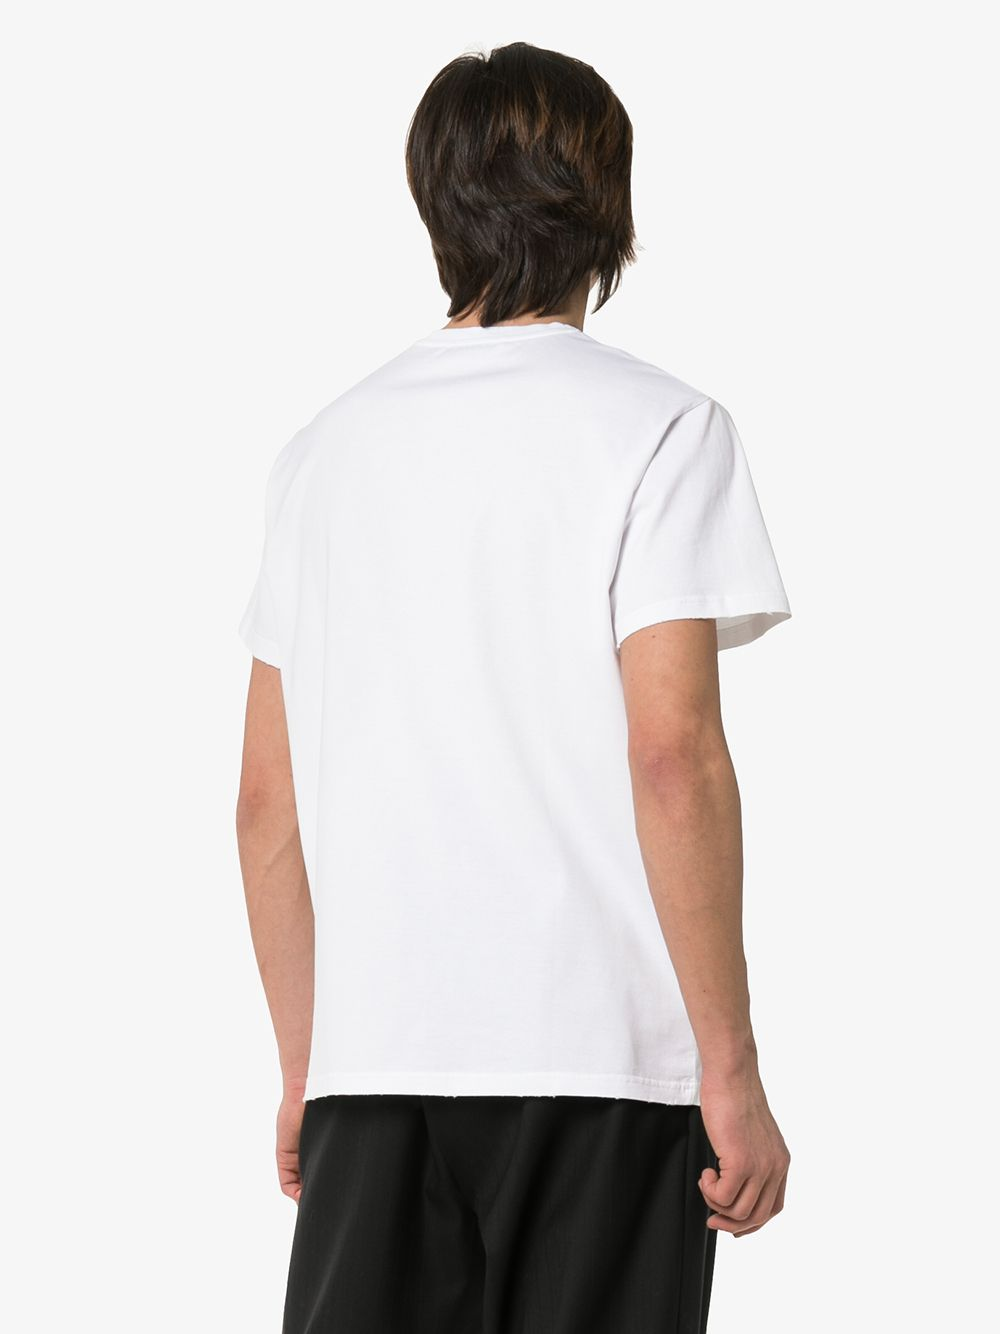 GIVENCHY | футболка с размытым логотипом | Clouty